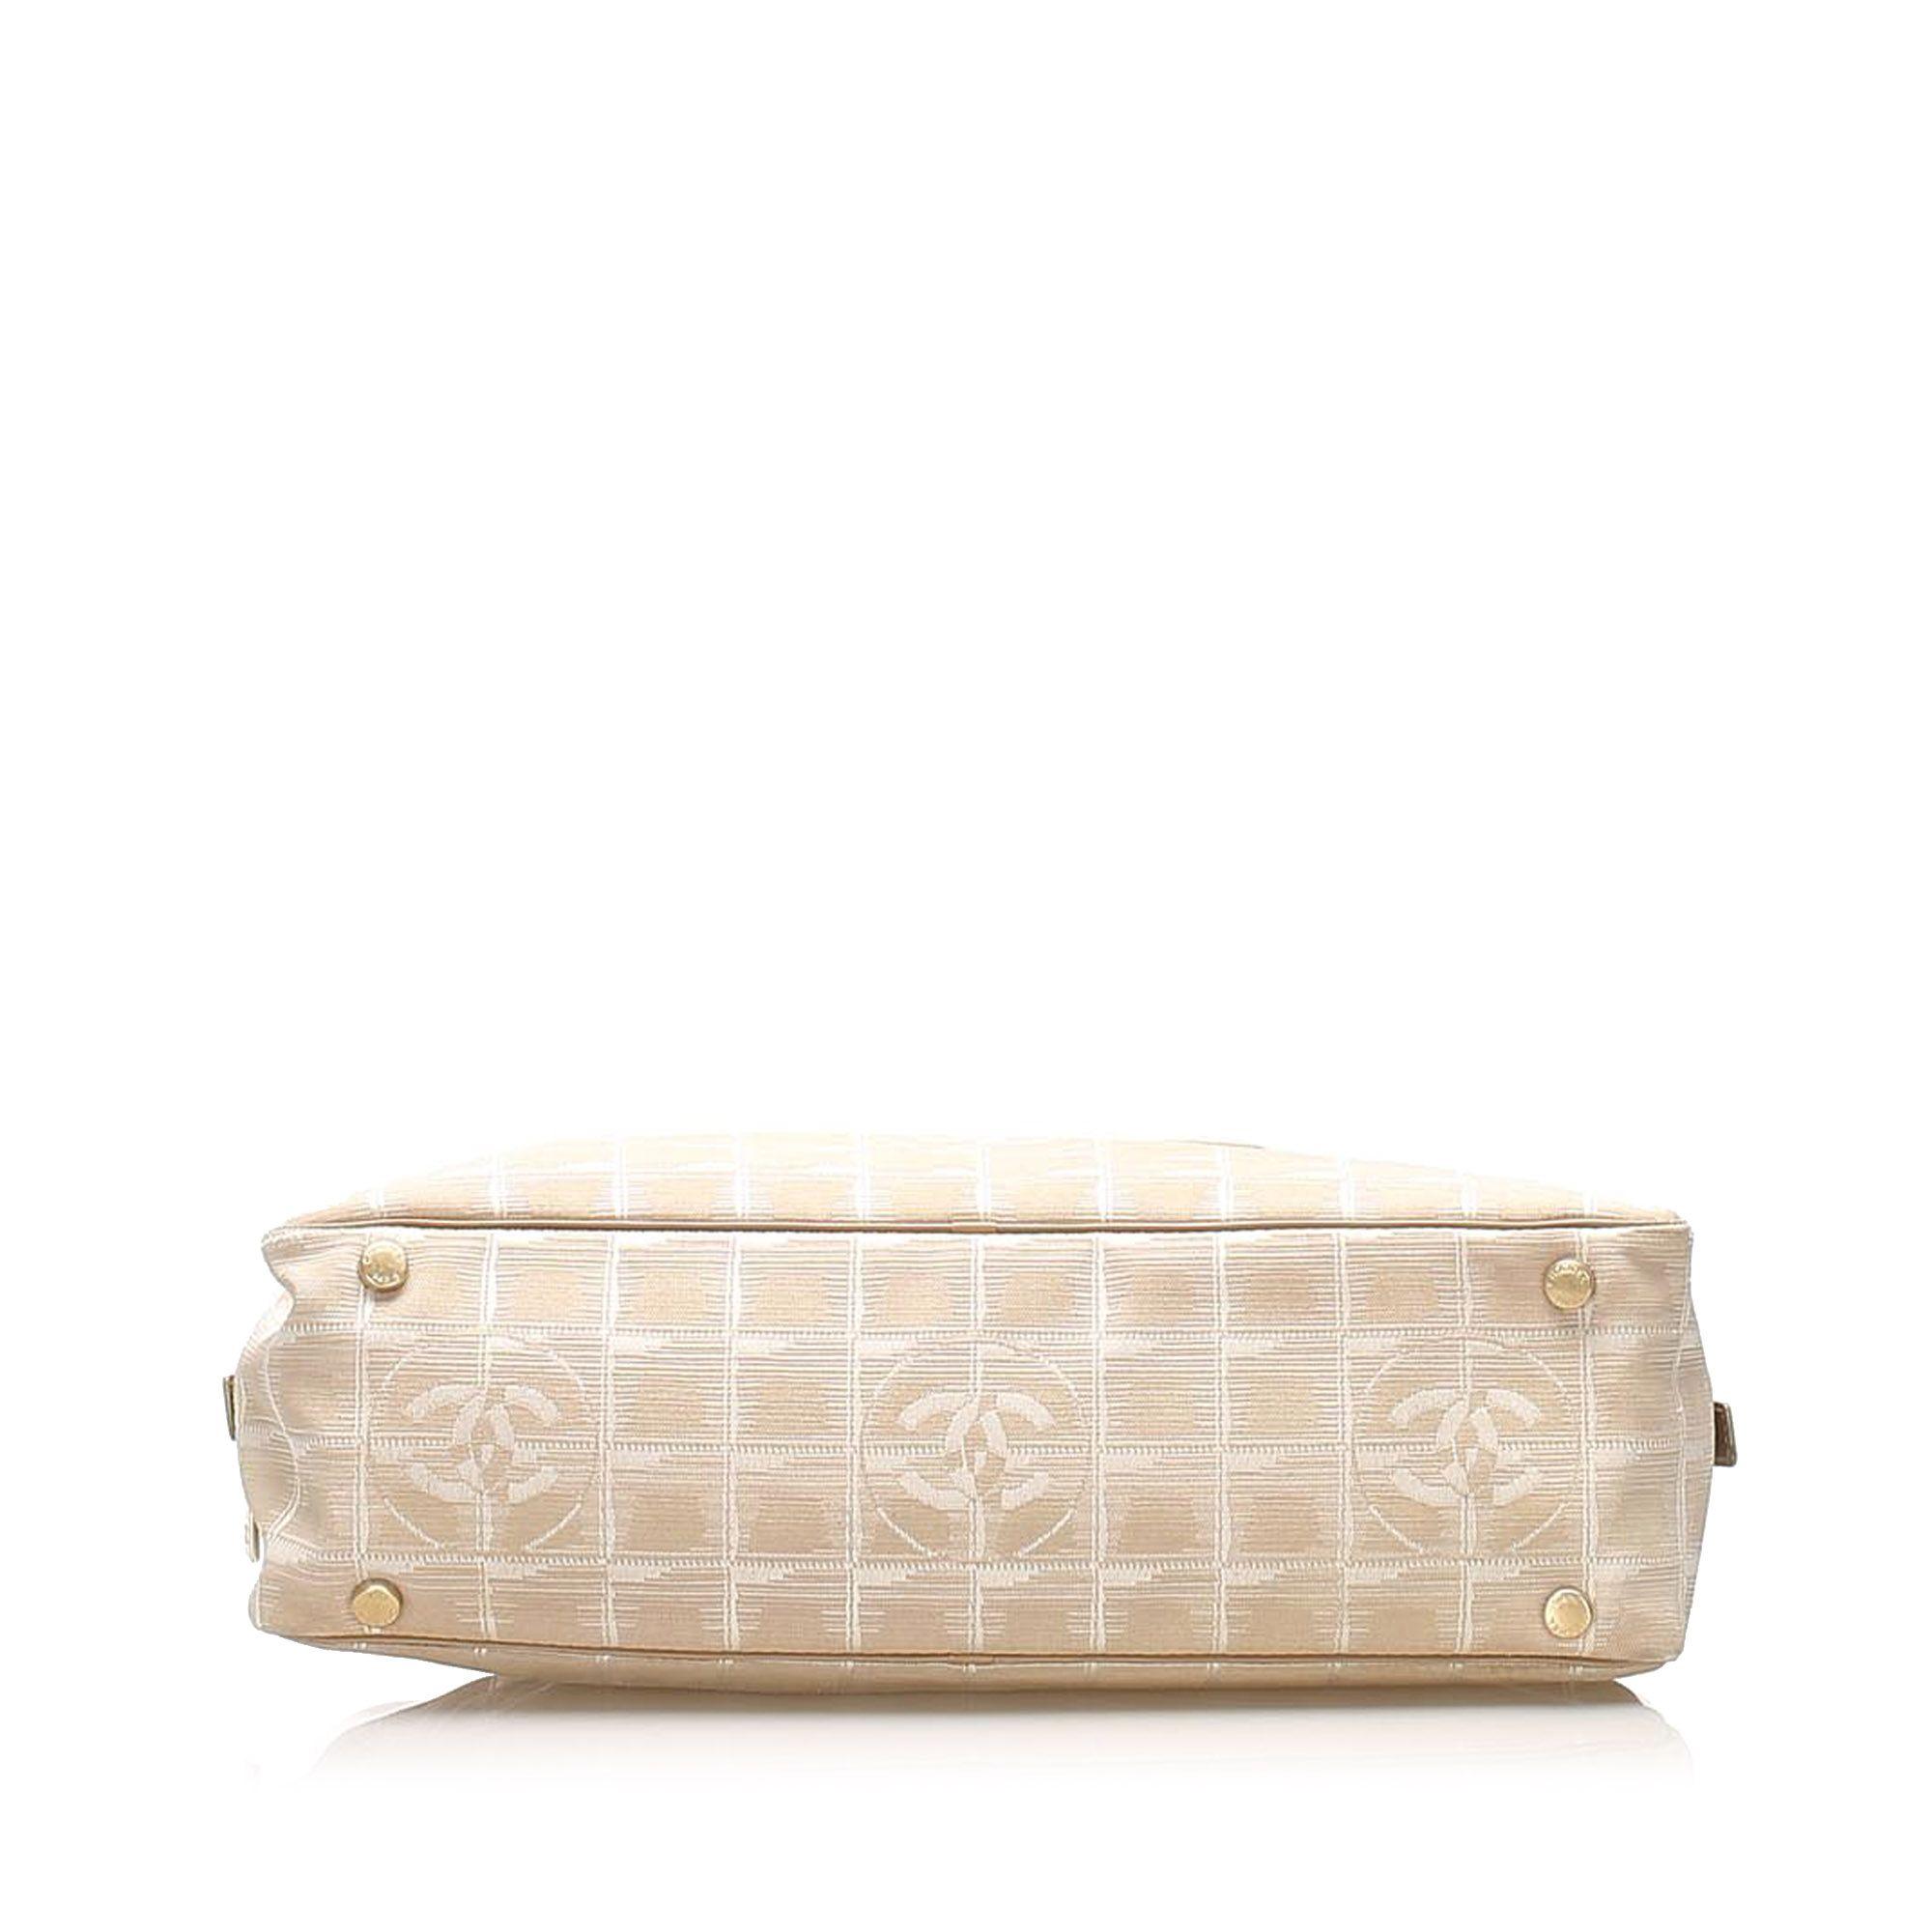 Vintage Chanel New Travel Line Canvas Handbag Brown